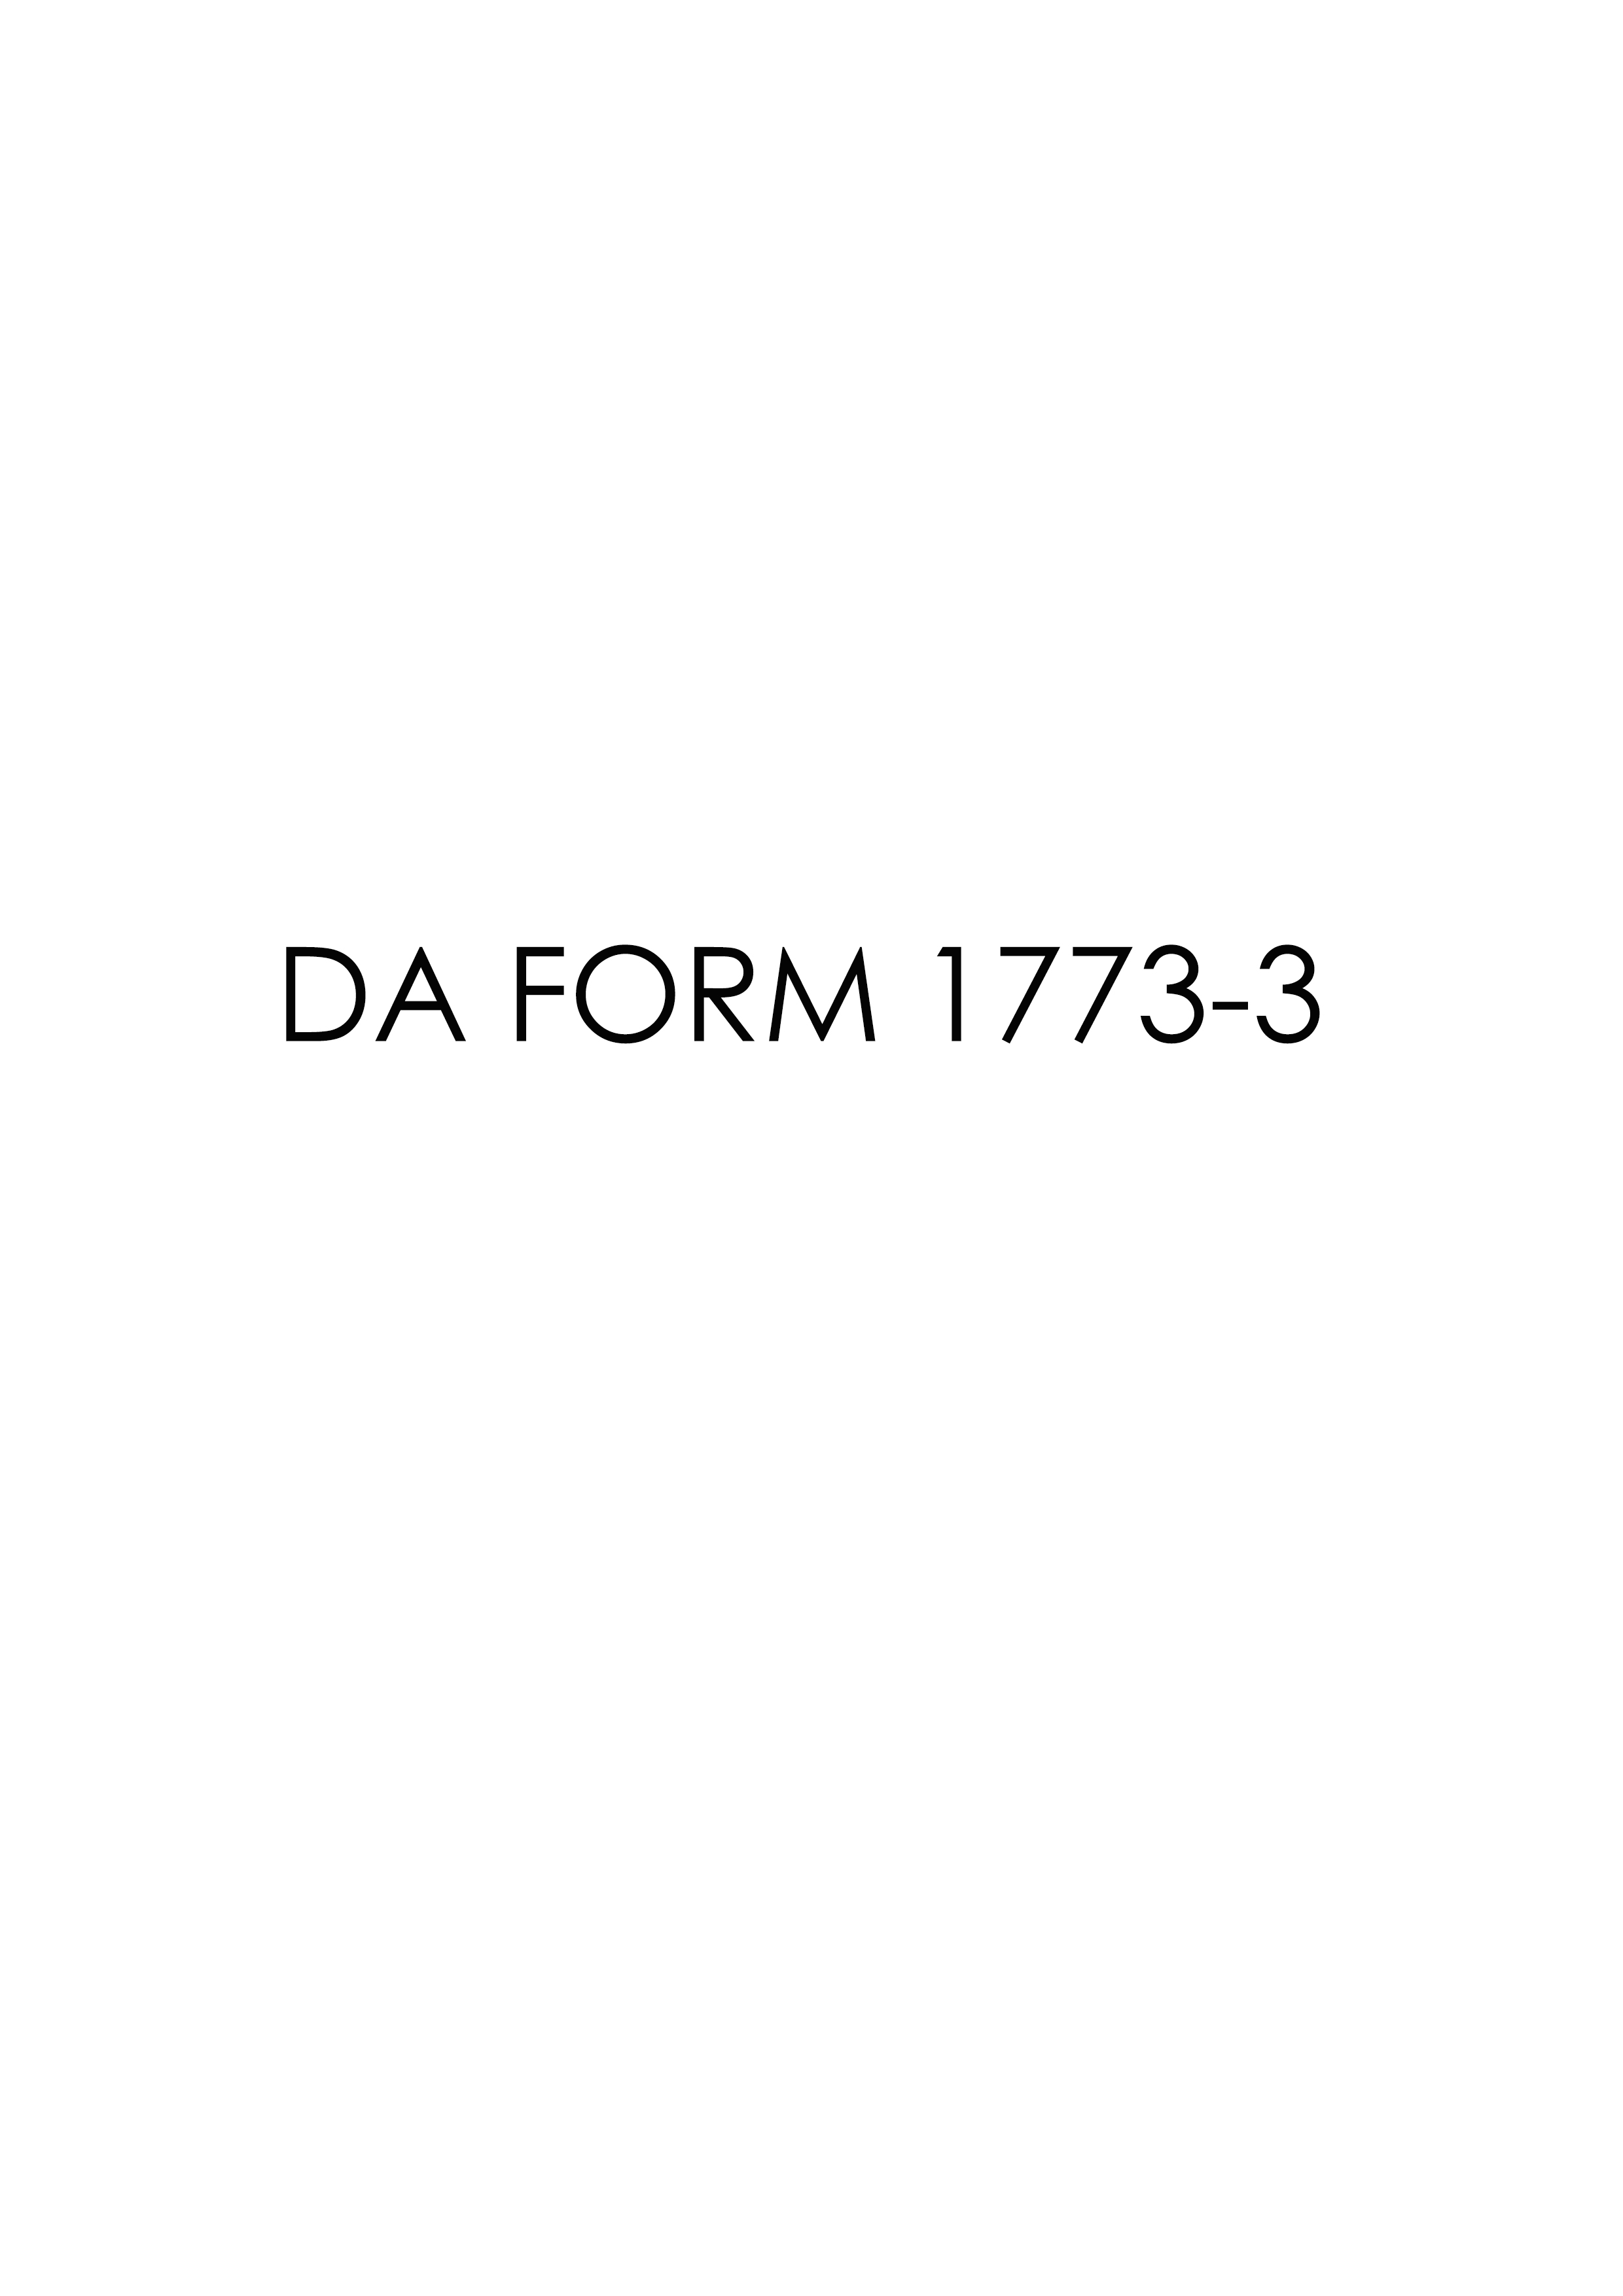 Download da Form 1773-3 Free